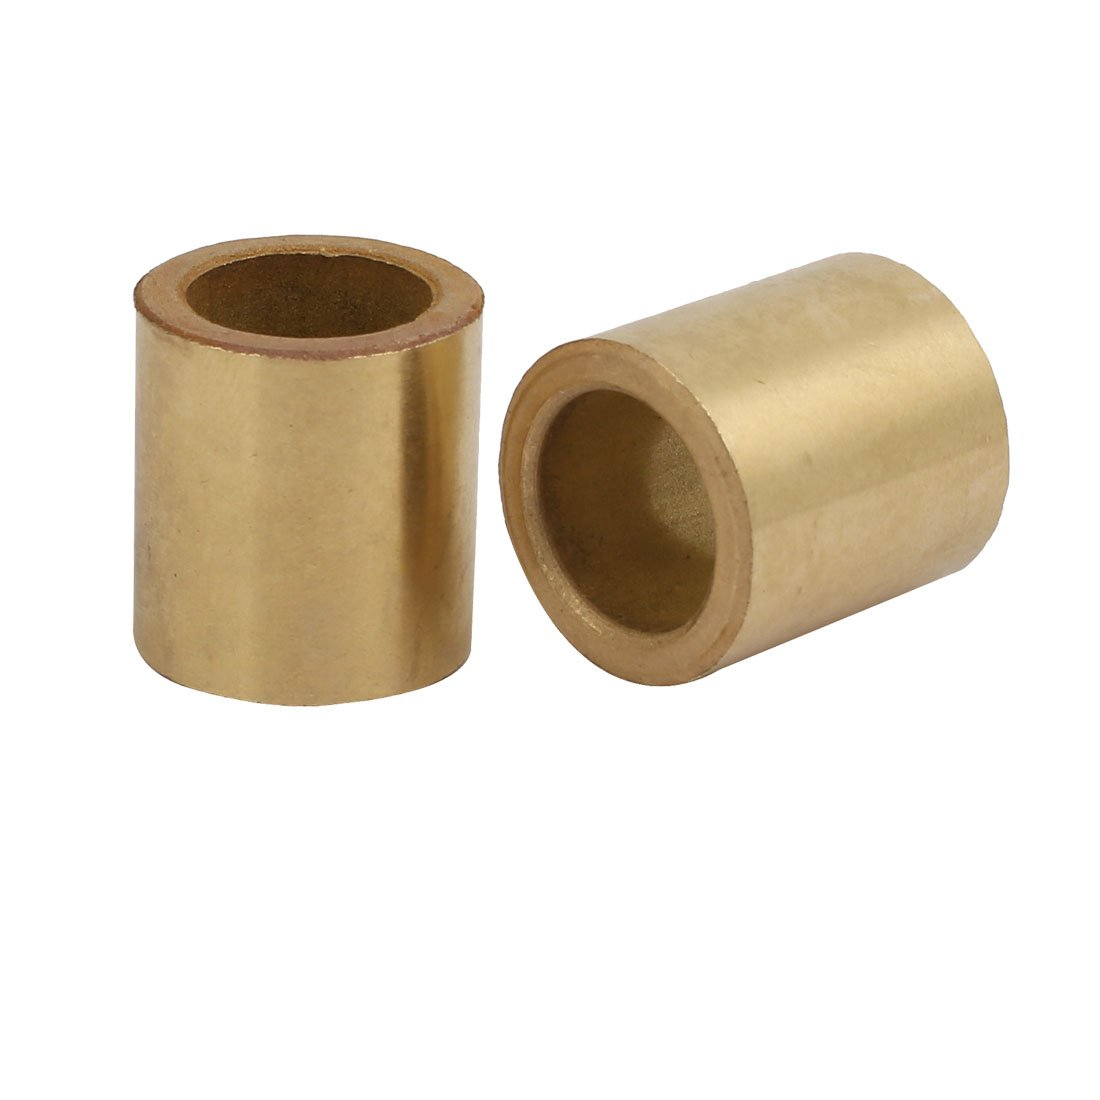 uxcell14mmx20mmx22mm Powdered Metal Bronze Sleeve Bearing Bushing Gold Tone 2pcs a17073100ux0047